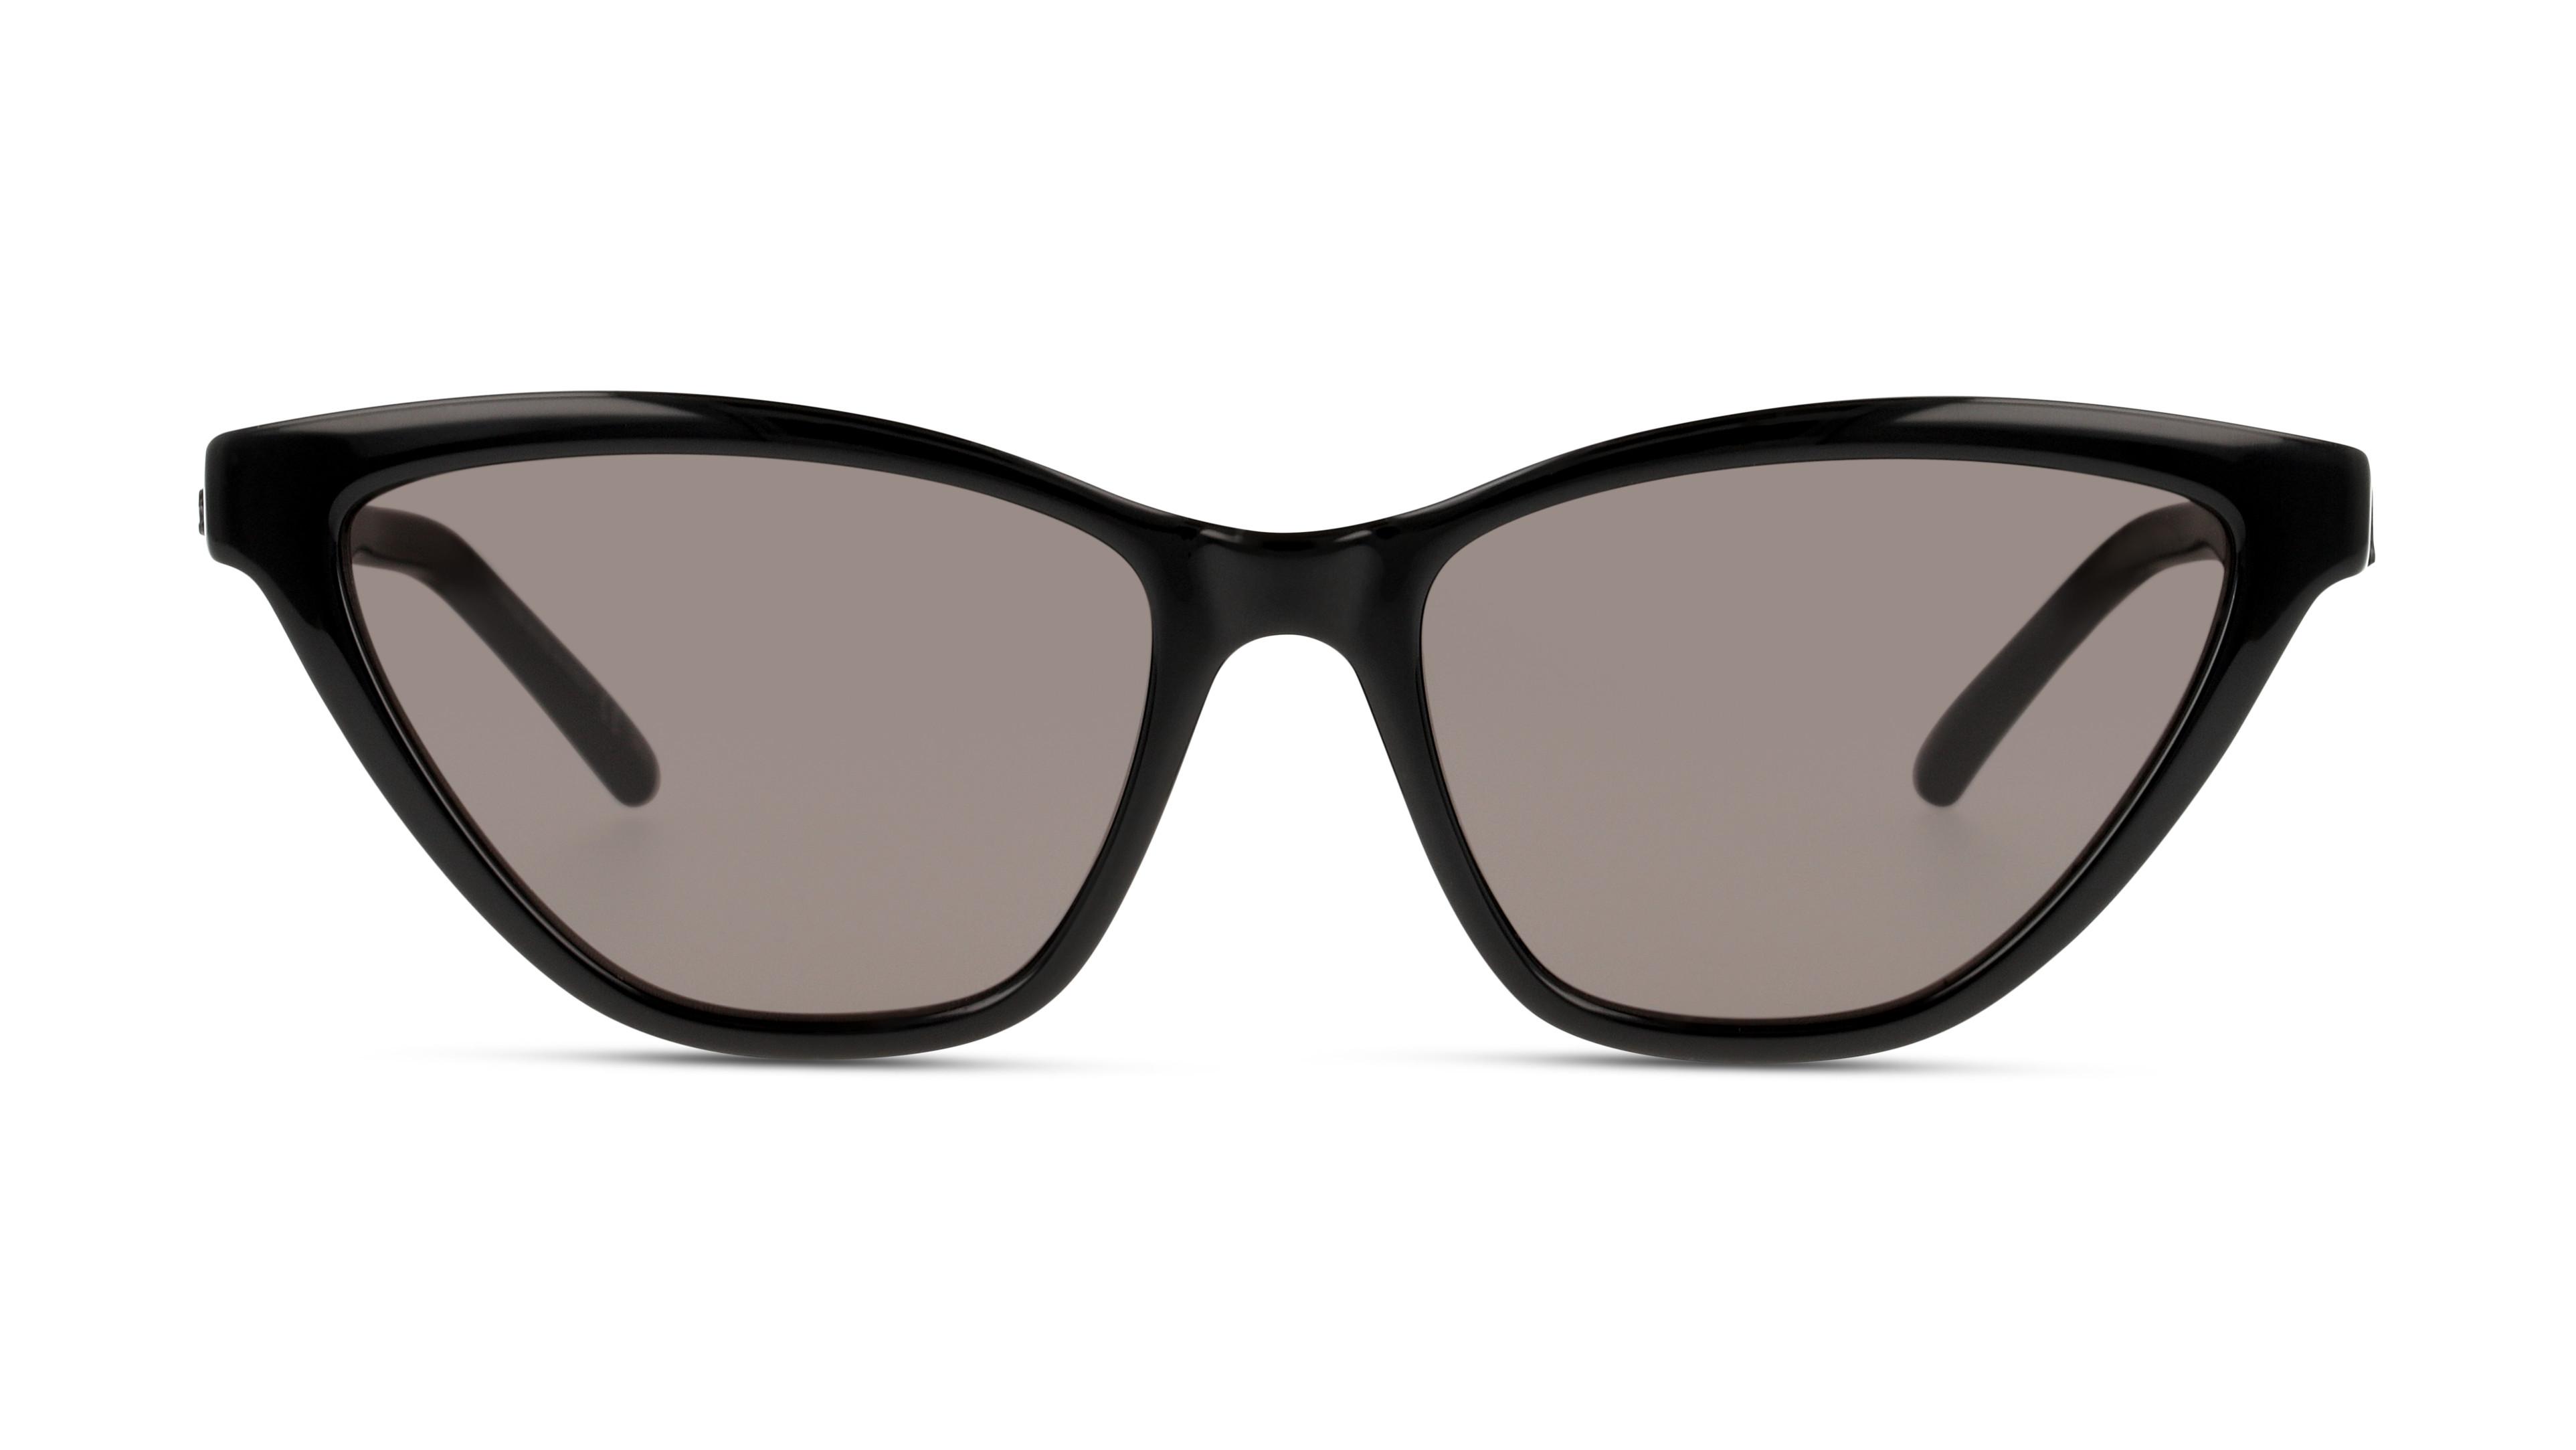 8056376302103-front-01-saint-laurent-sl_333-eyewear-black-black-black